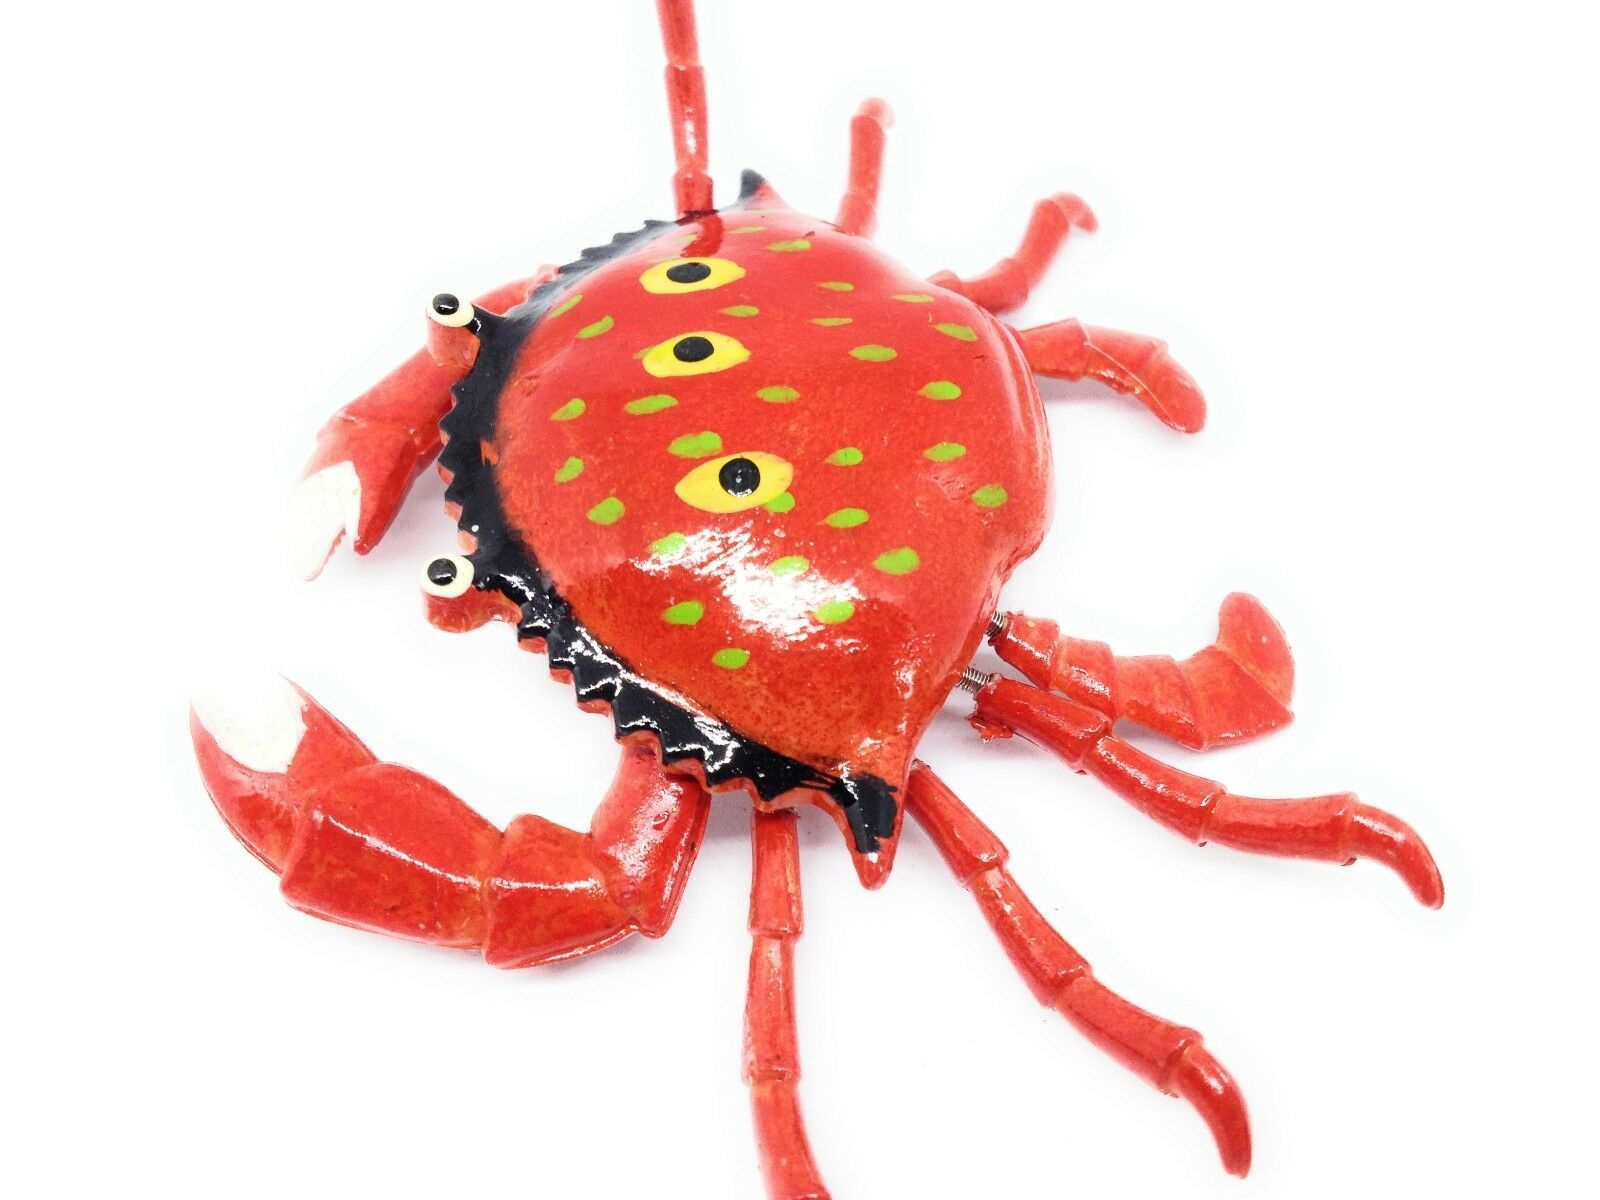 Fussel Tanzende Rot Krabbe Kühlschrank Magnet Küchen Dekor Meer Tiere